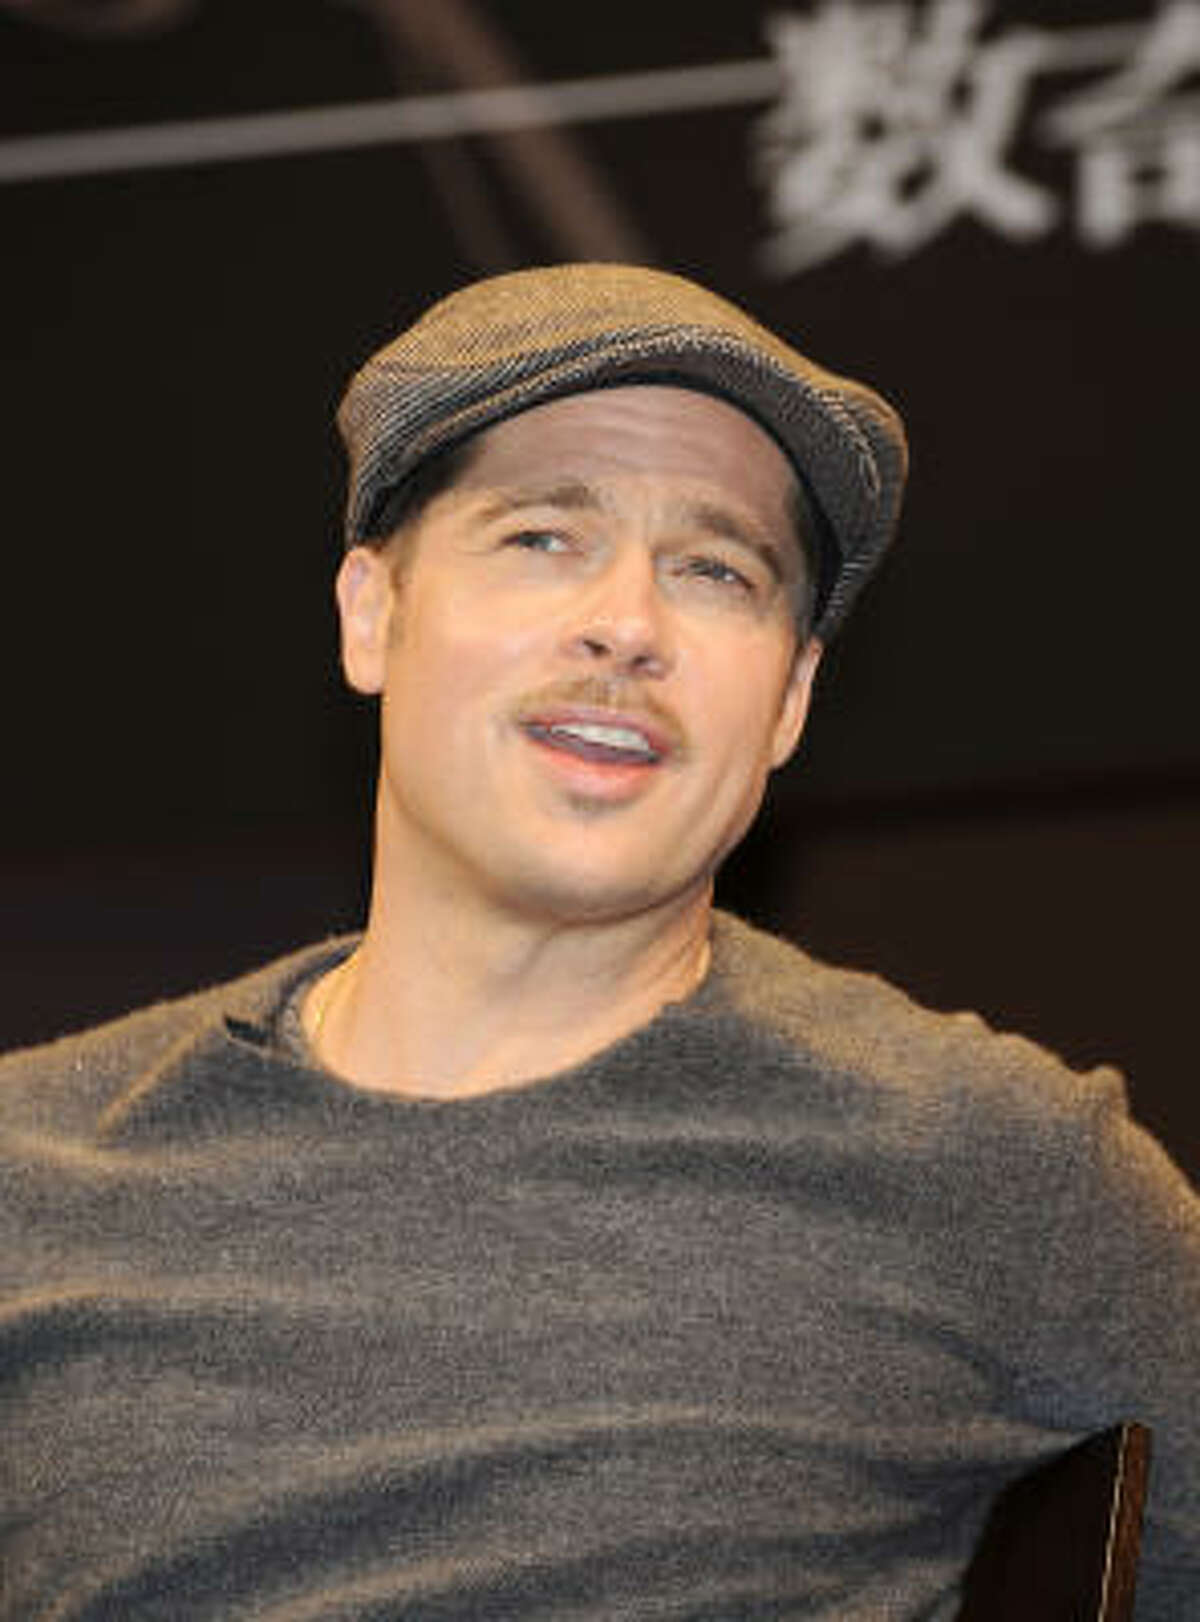 Brad Pitt was chosen as the best choice to teach theater classes.